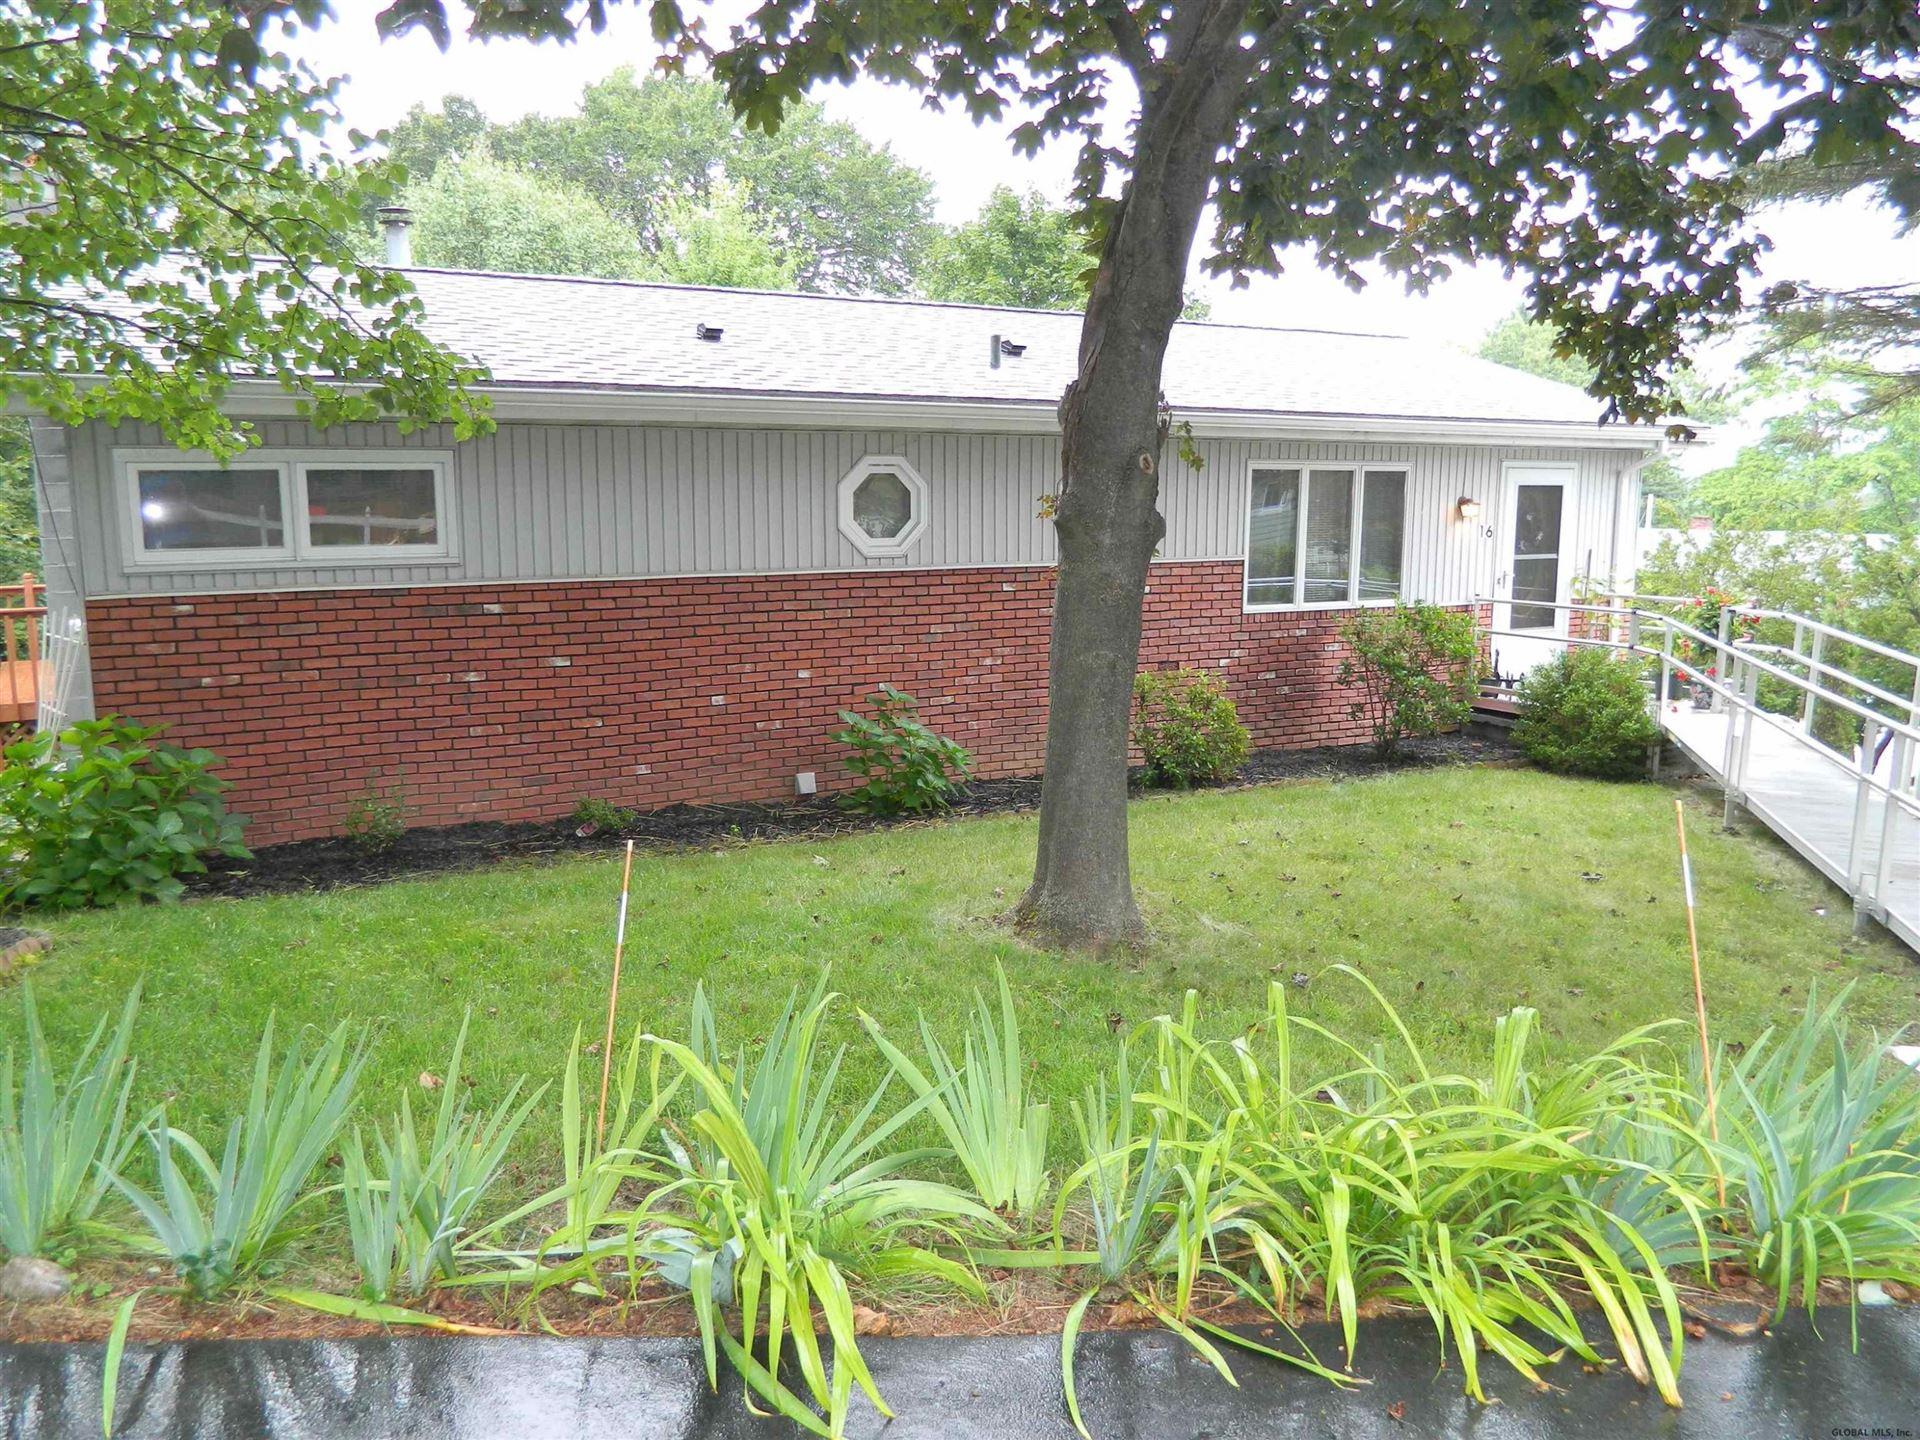 16 WORTHINGTON BLVD, North Greenbush, NY 12198 - #: 202127861